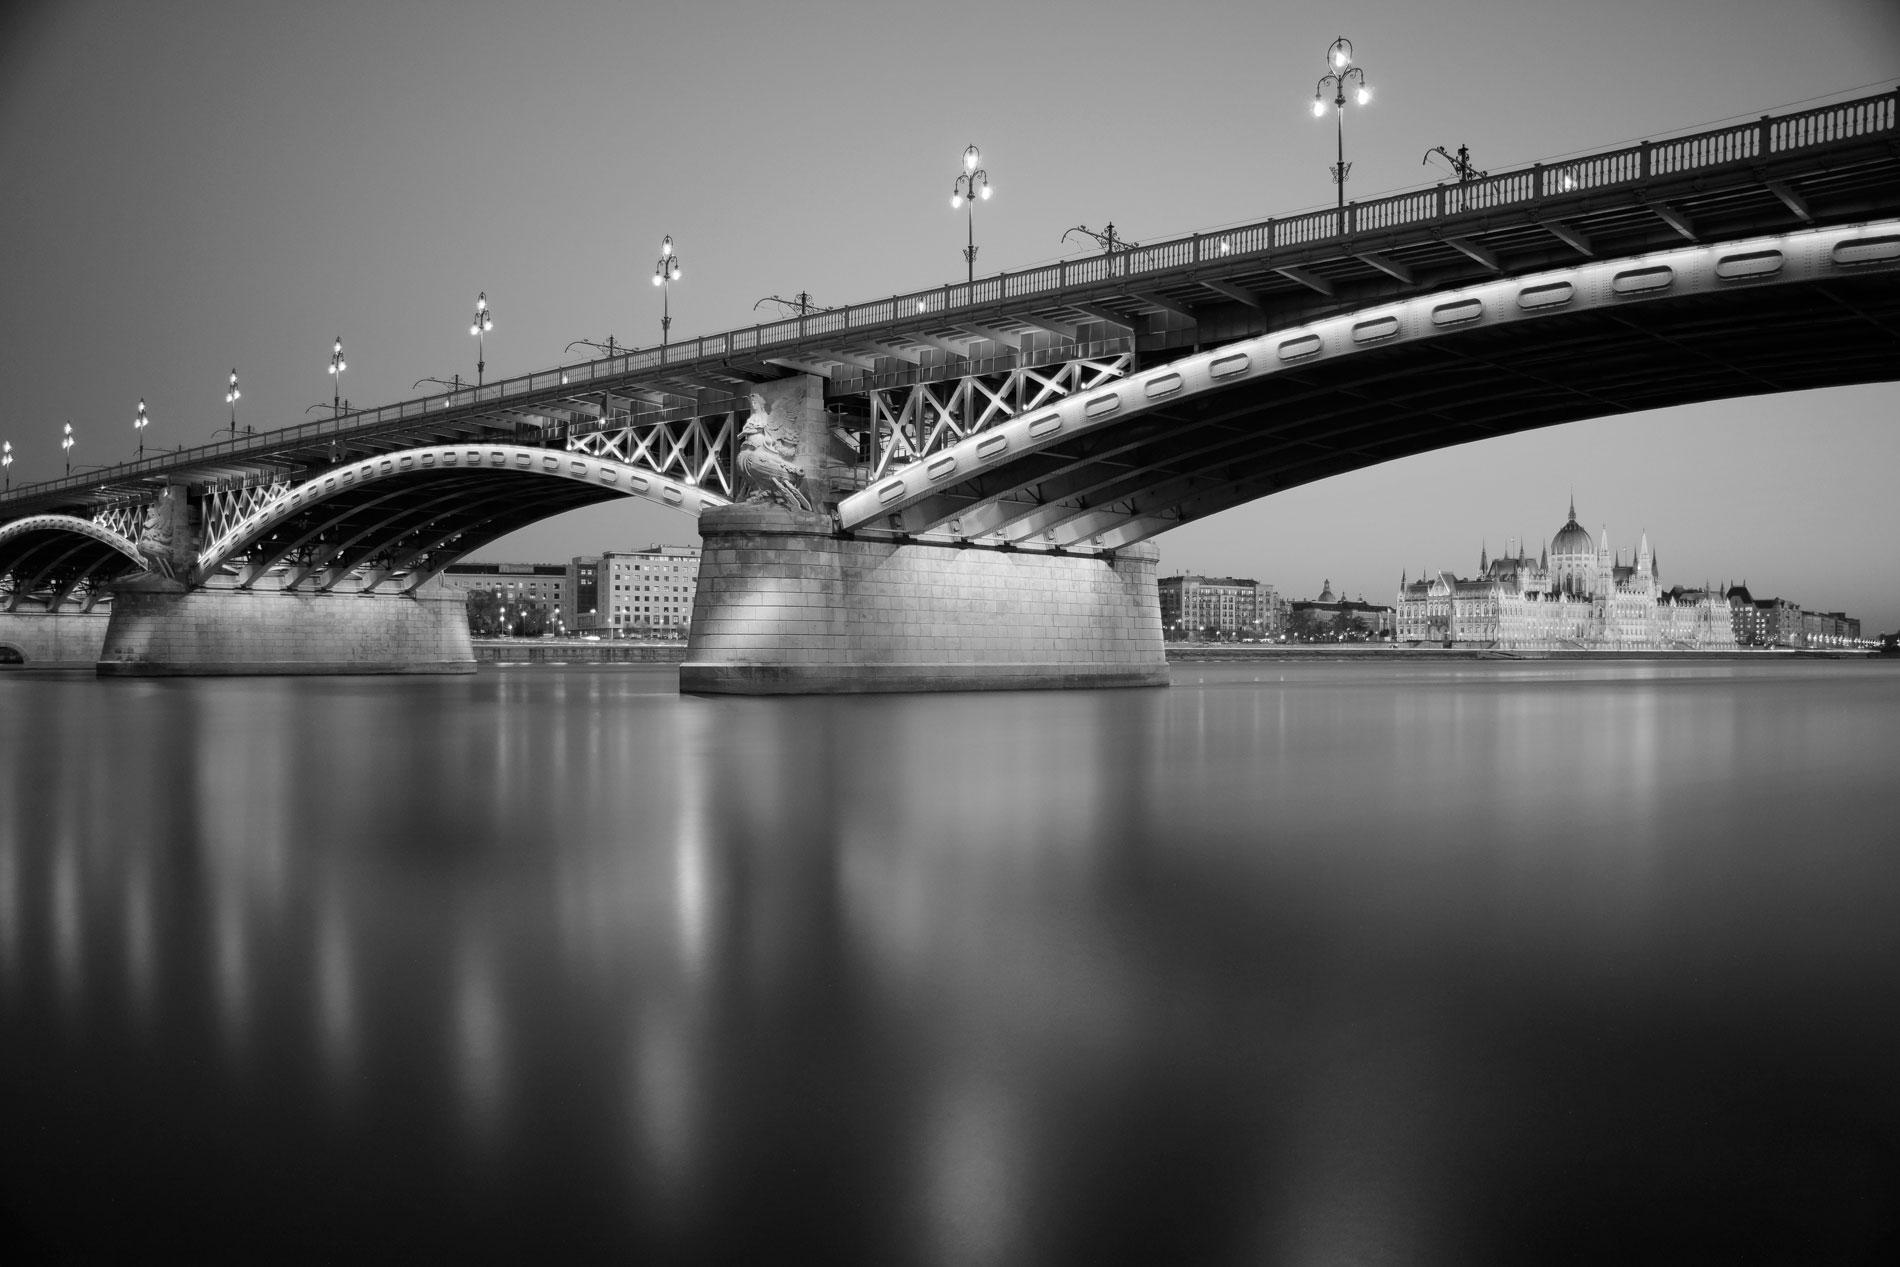 budapest_atthary_photography_bridge_24